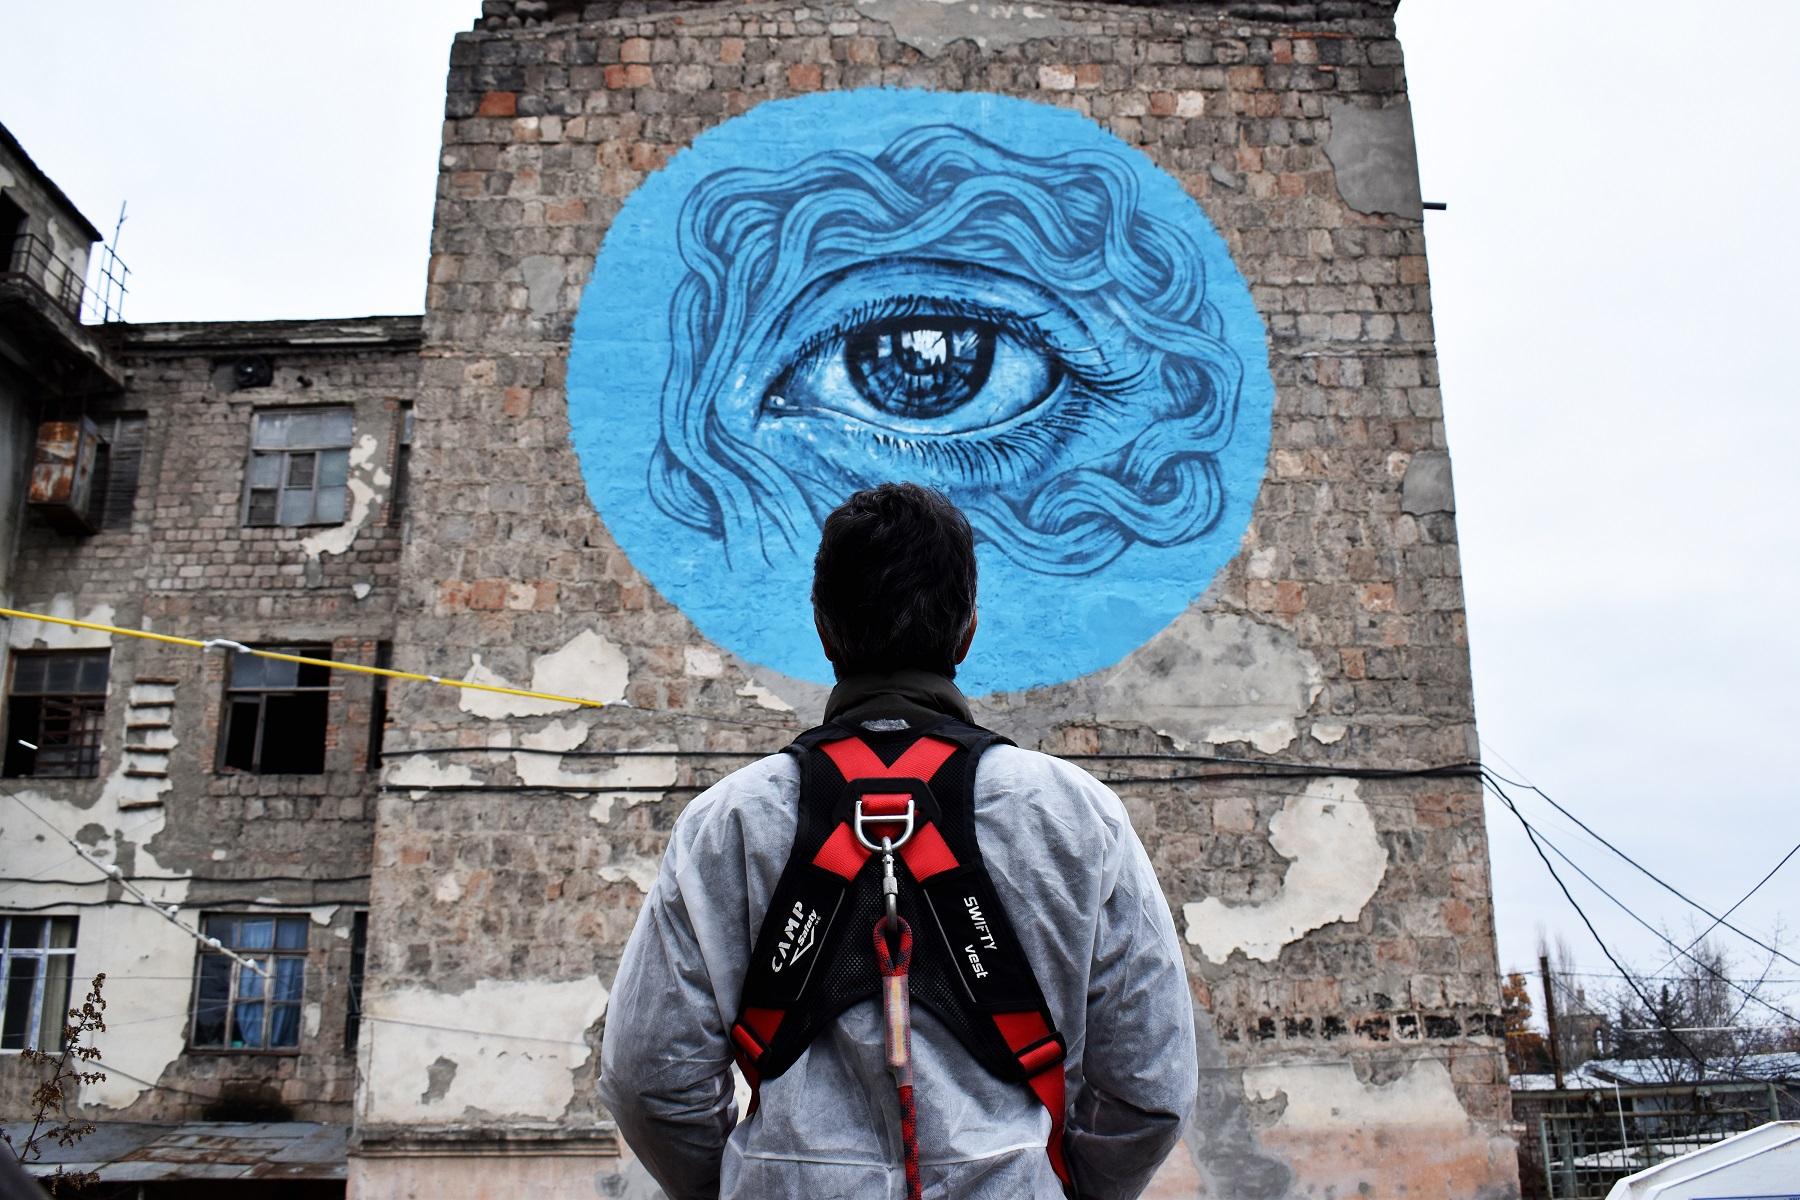 DSC 0386 #art featured, арт, Бразилия, германия, граффити, Грузия, Дино Бенто, искусство, Лапиз, мурал, Саша Корбан, стрит-арт, тбилиси, украина